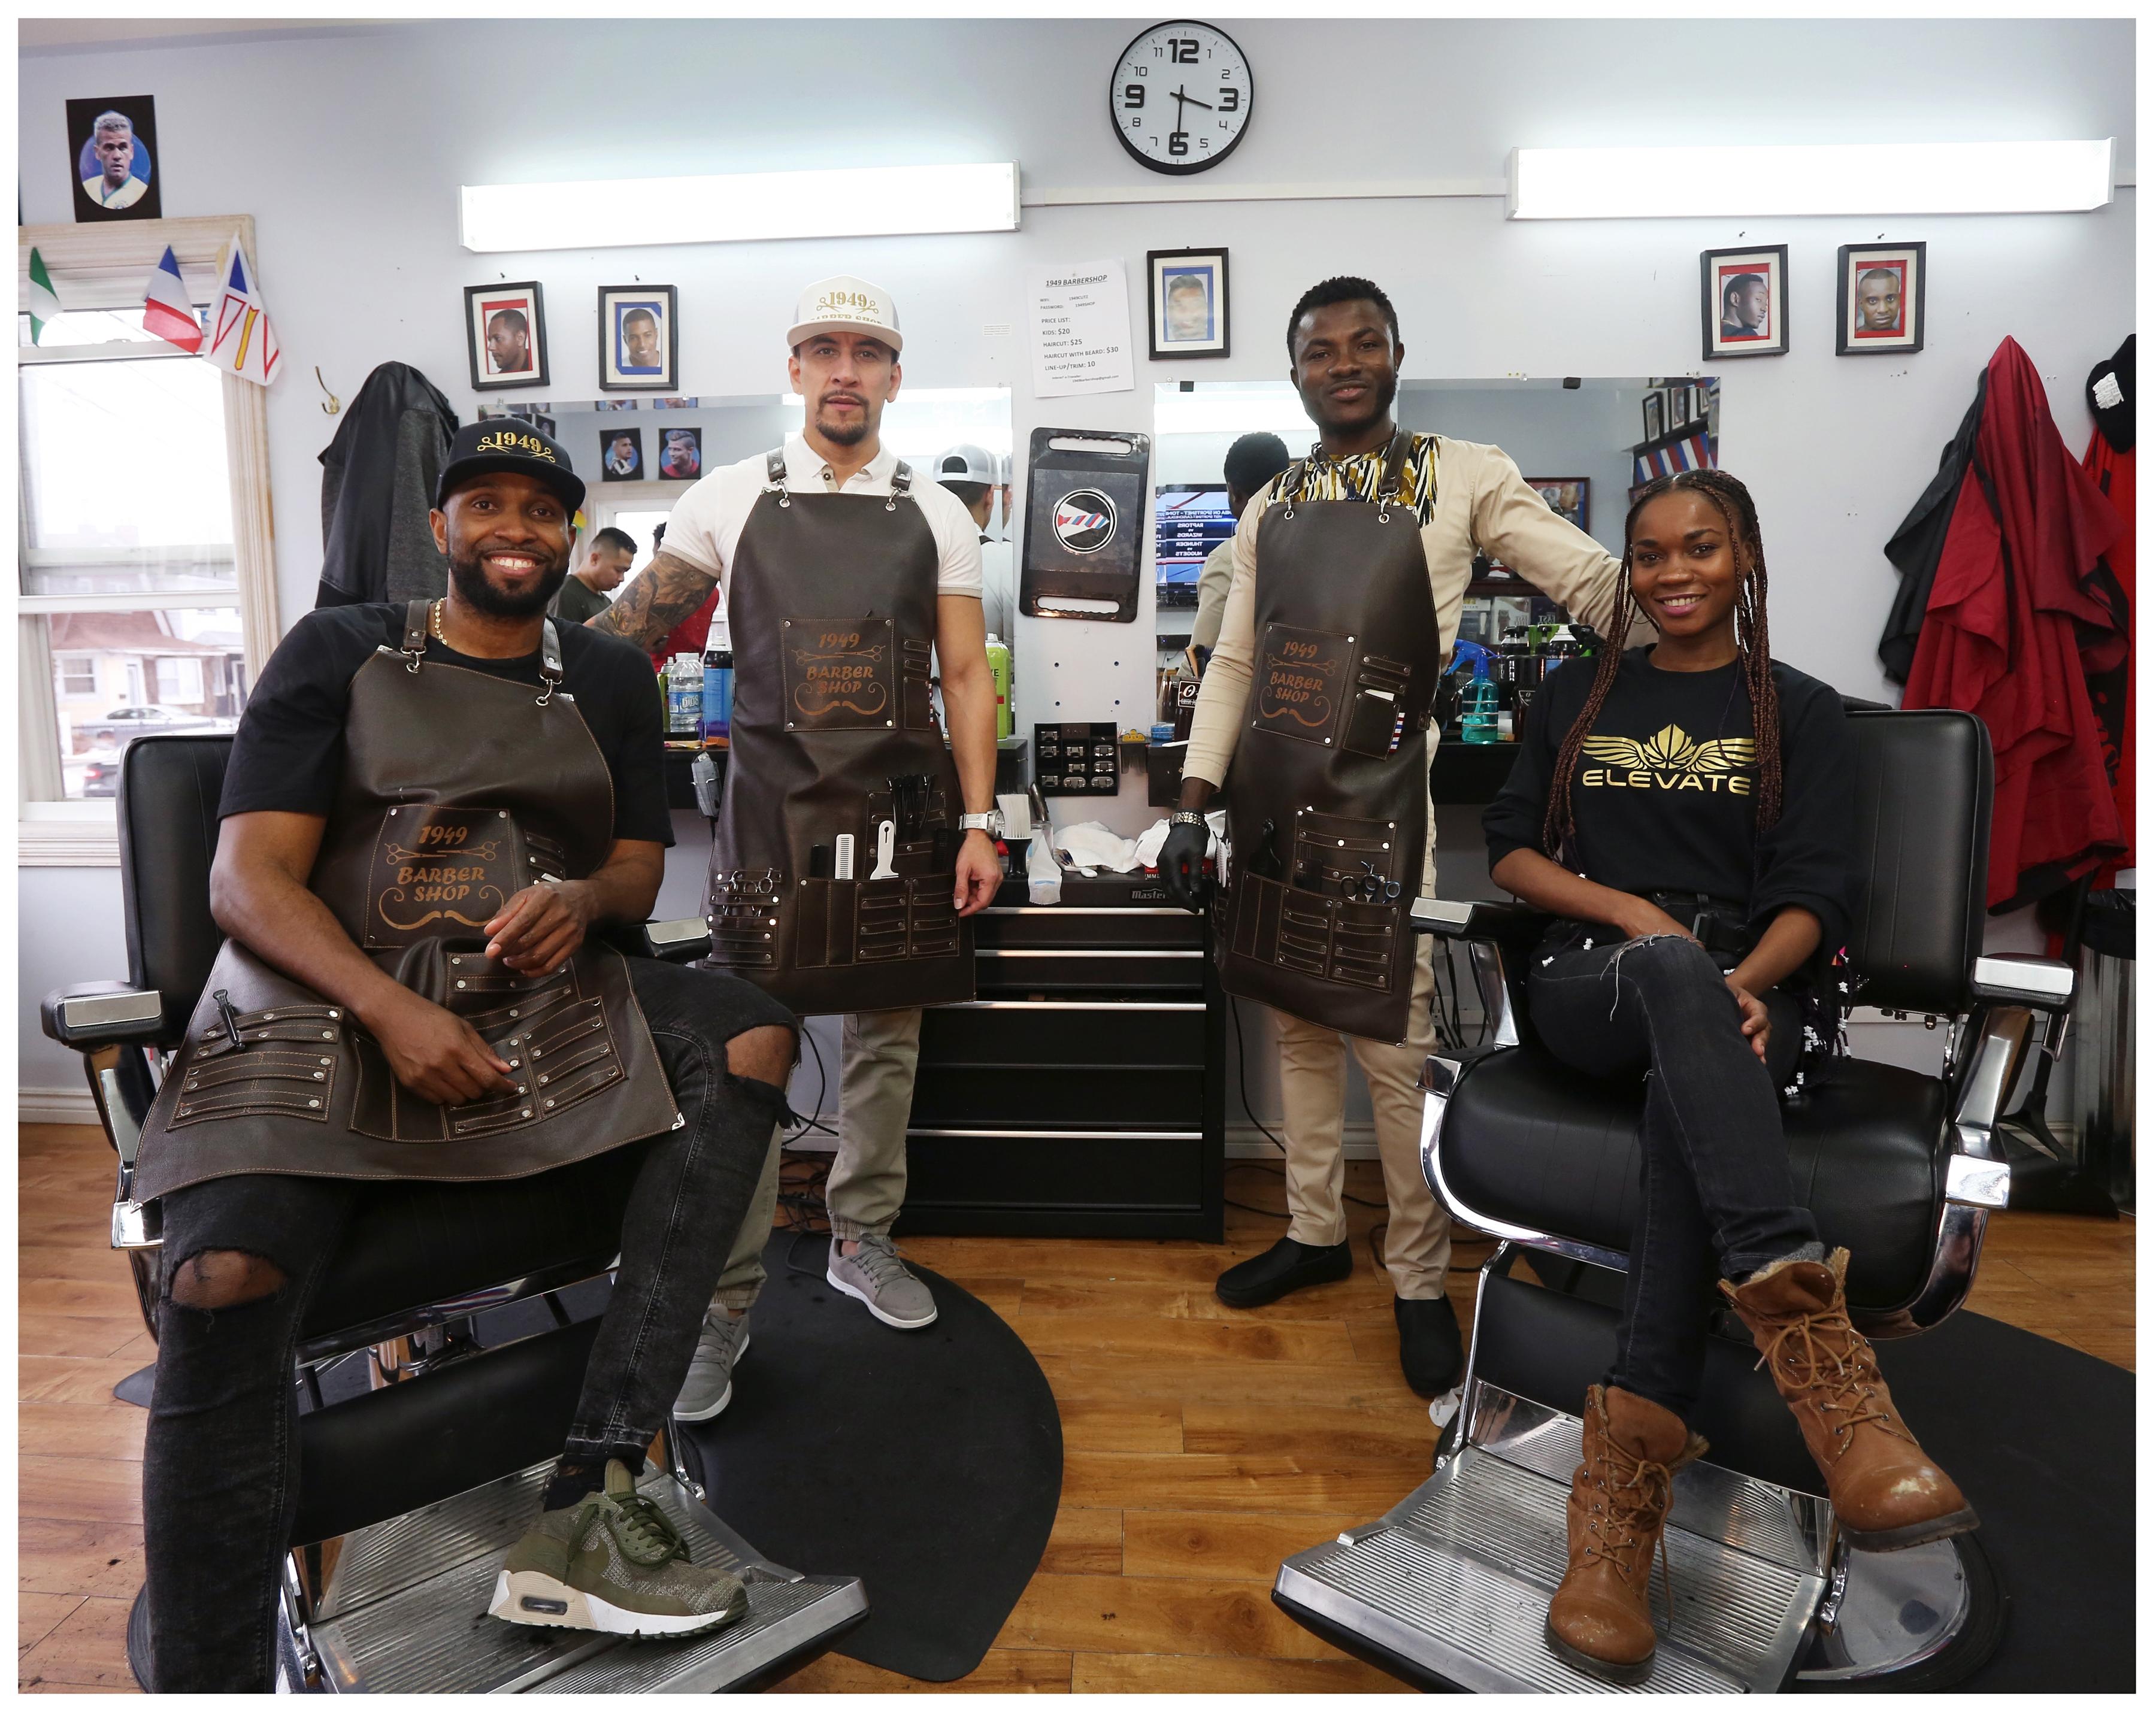 The staff of 1949 Barber Shop on Mayor Avenue in St. John's. Left-Right: Gustavo Valoyes (Cali, Colombia), Ricardo Onegas (Cucota, Colombia), Yaw Antwi-Adjei (Ghana), Joana Smits (Angola). (Paul Daly)